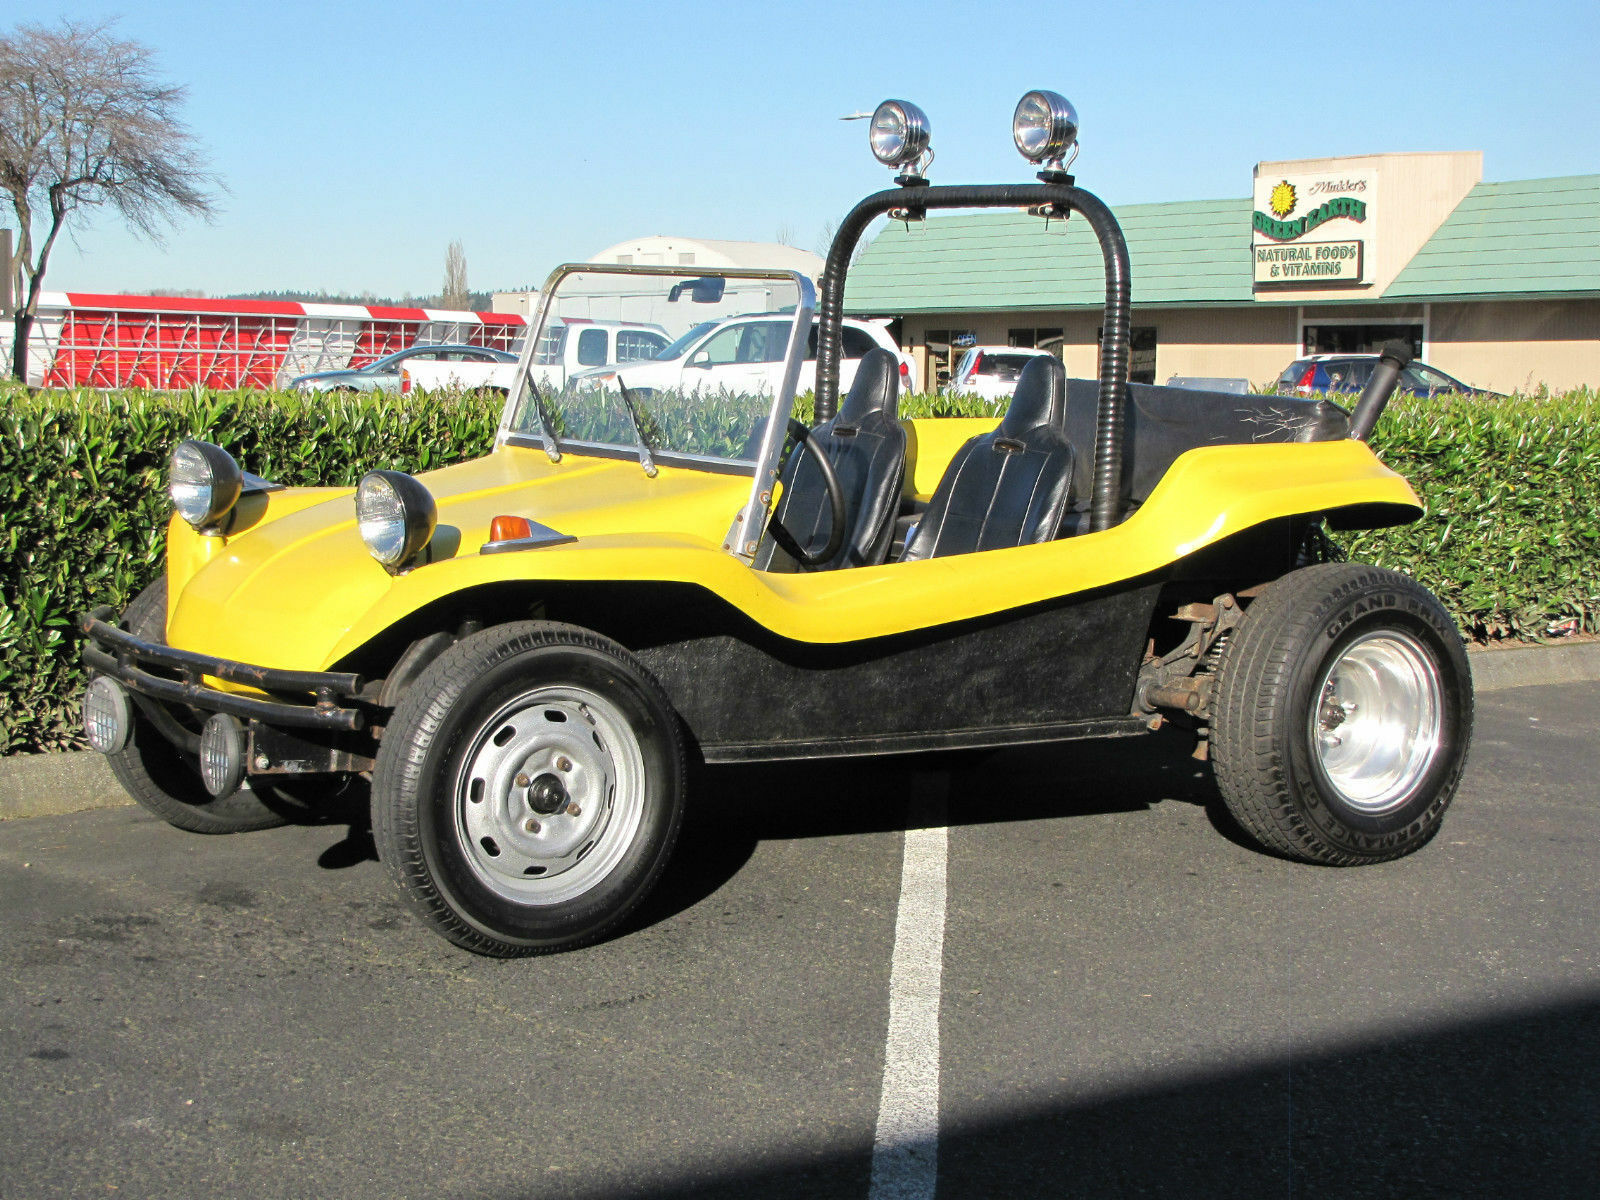 Manx Buggy Kit Ontario Active School Travel Meyers Wiring Harness Top 10 Cars Ebay